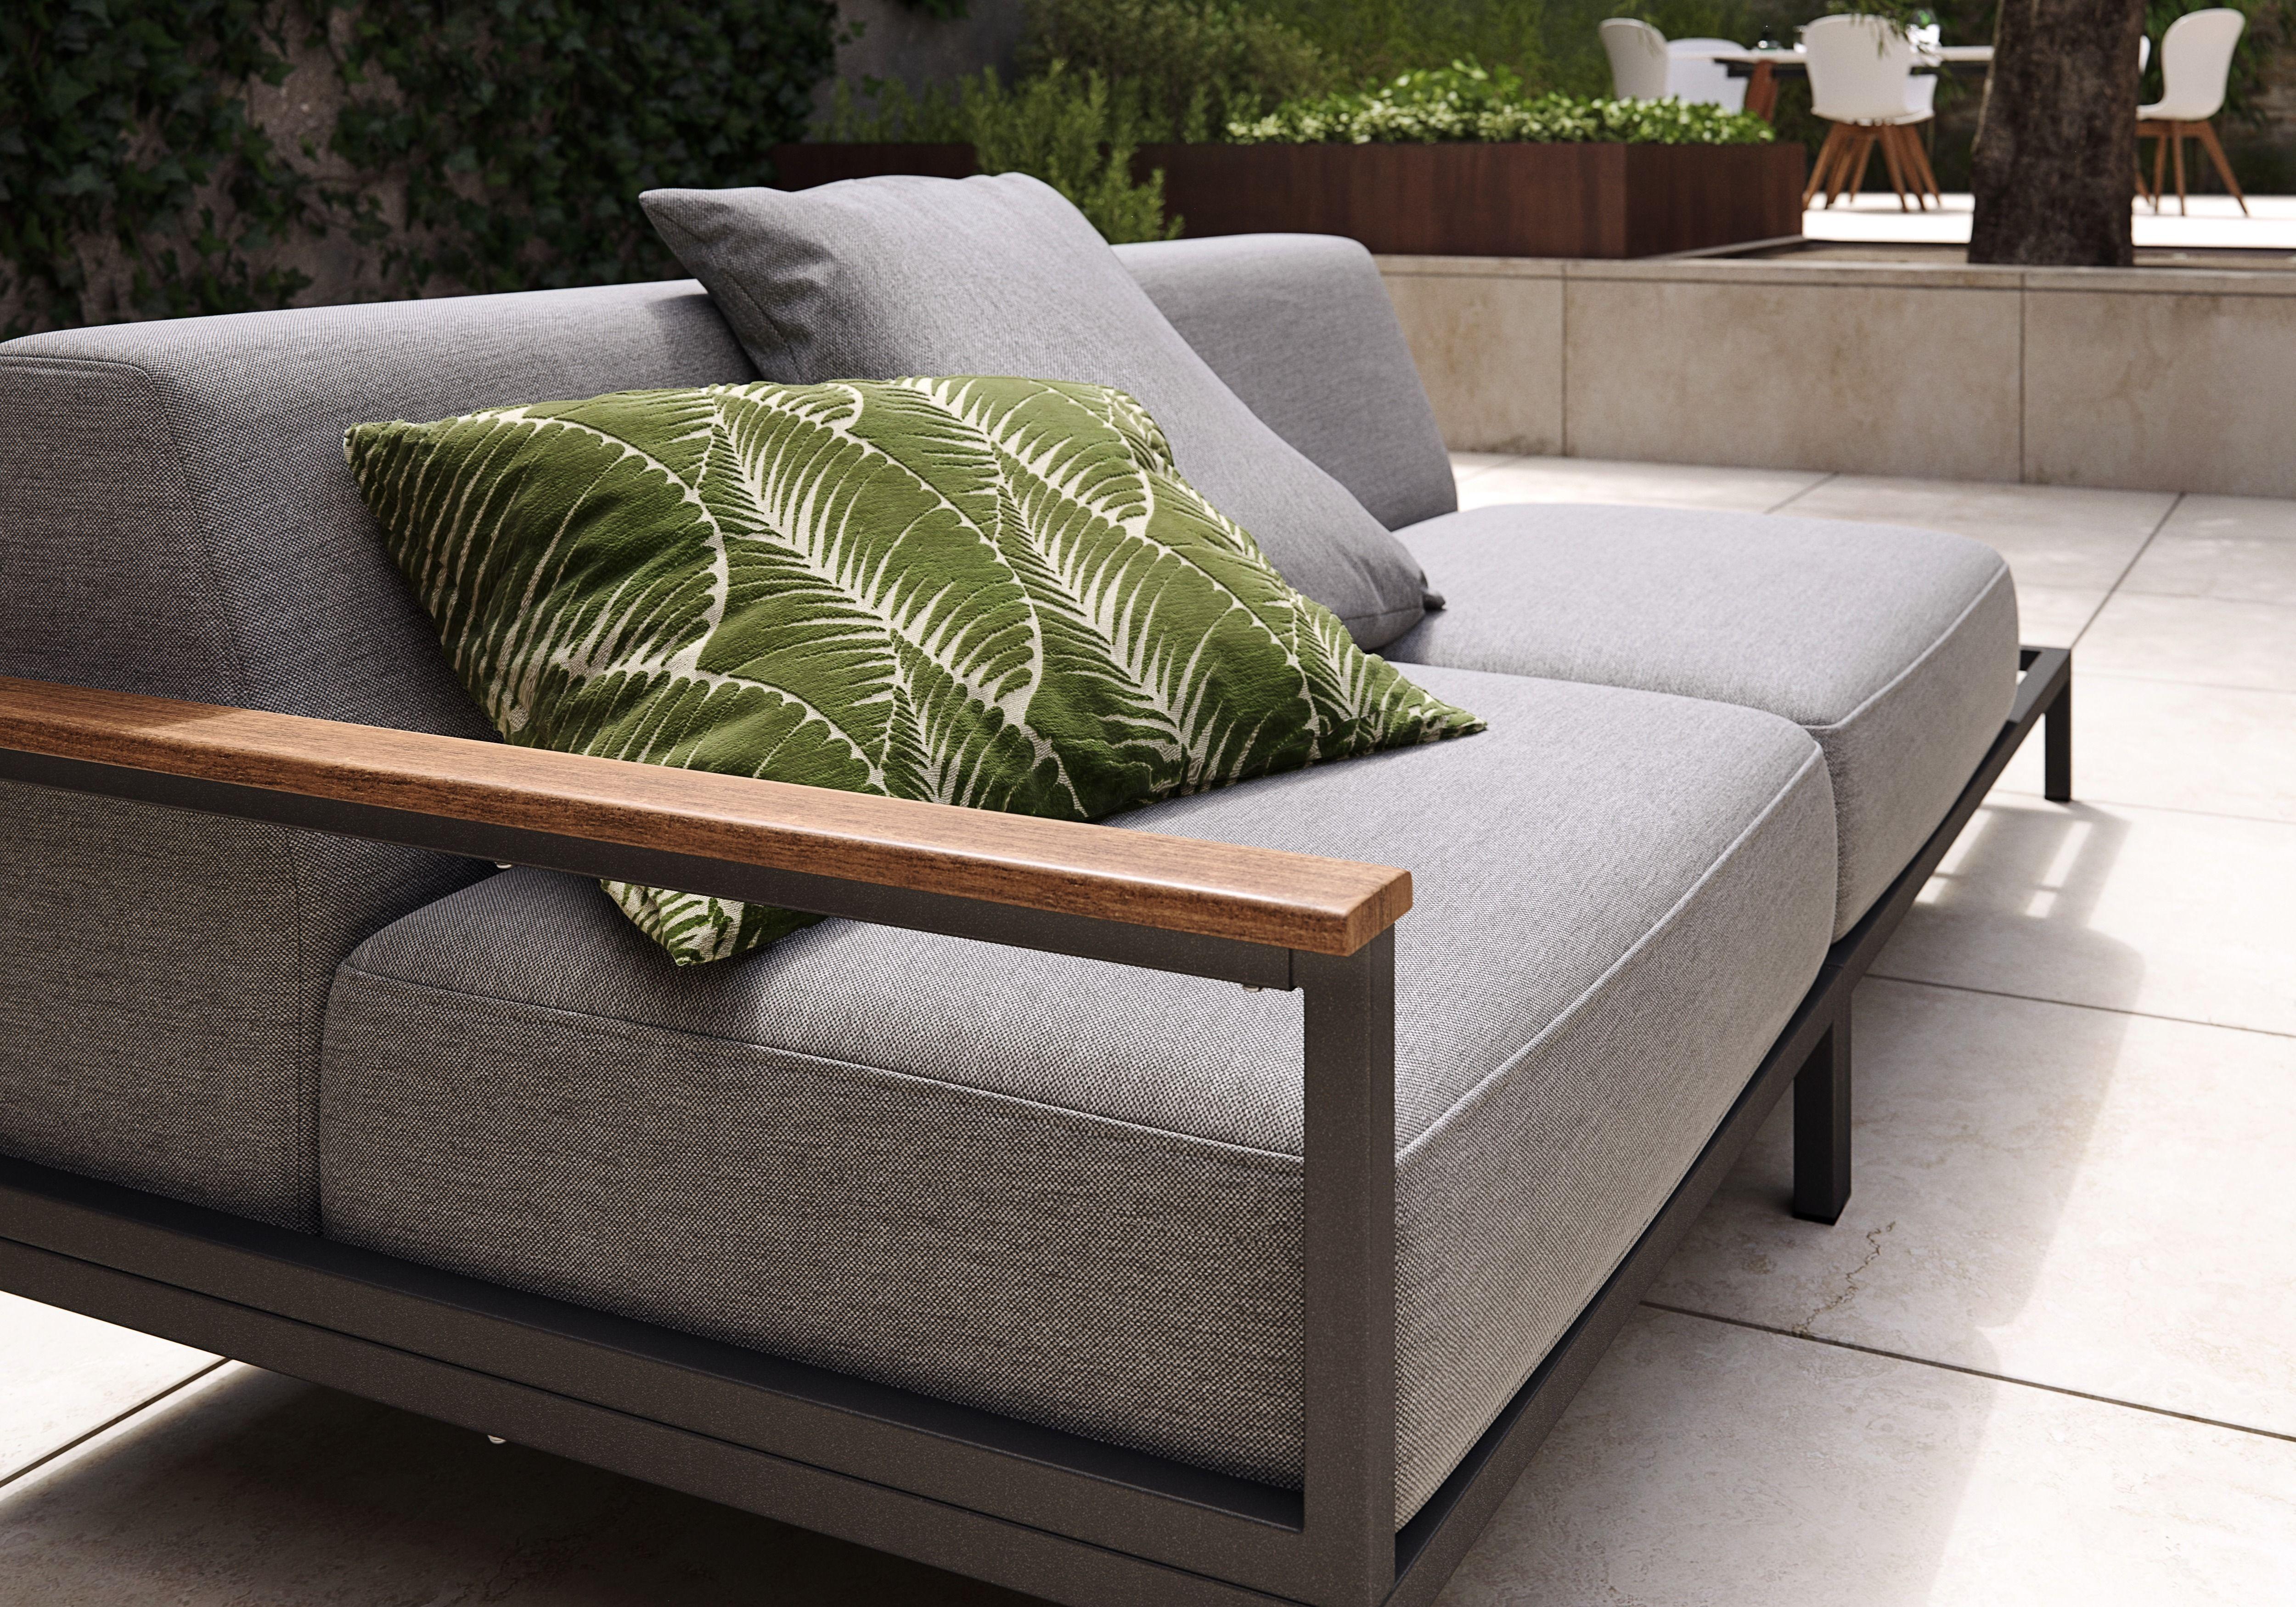 3fbb449aa85cbadbb1d1594906a55e1b Impressionnant De Ikea Table Exterieur Conception